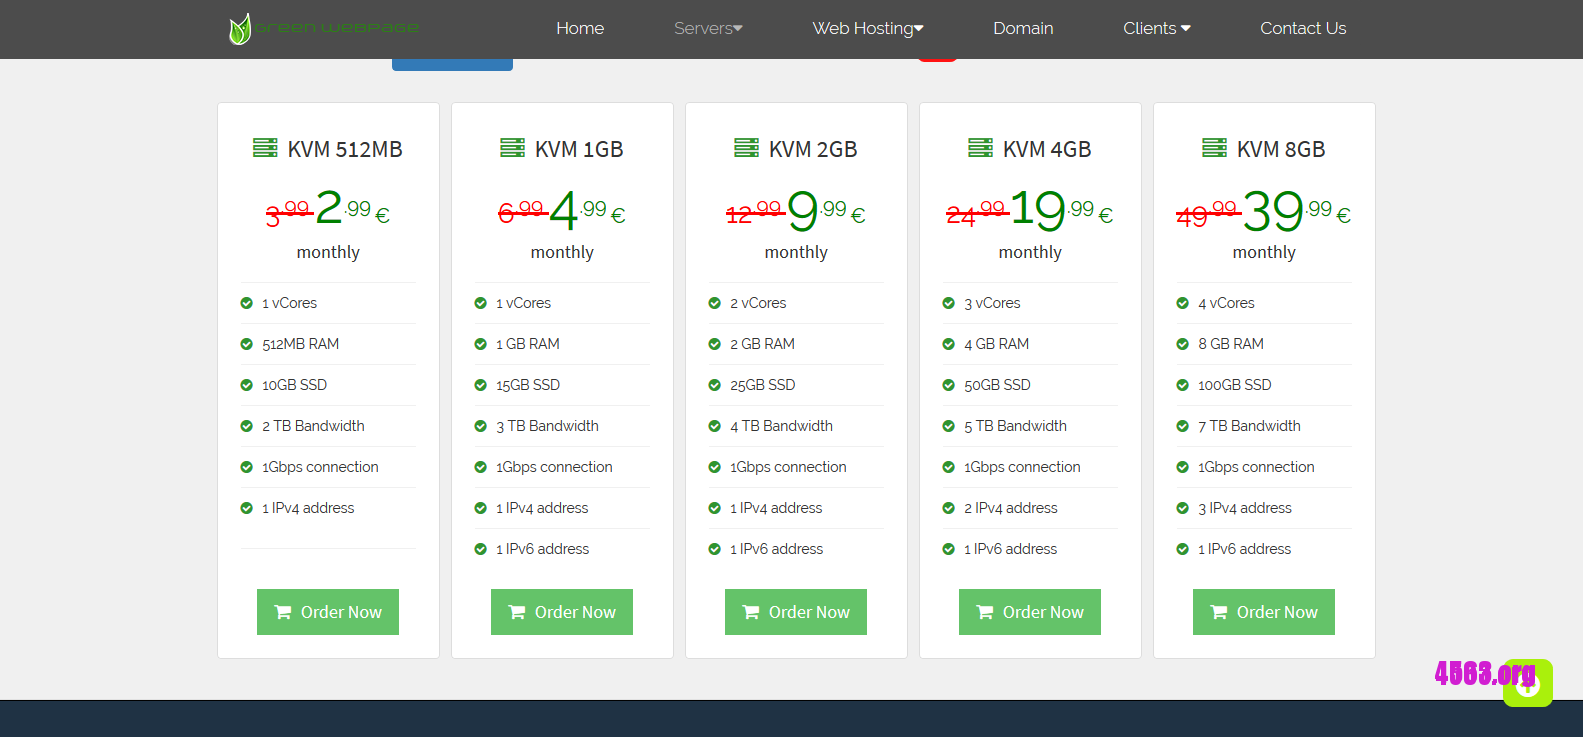 GreenWebPage欧洲KVM VPS -512MB/15GB SSD/3TB @ €2.54/月